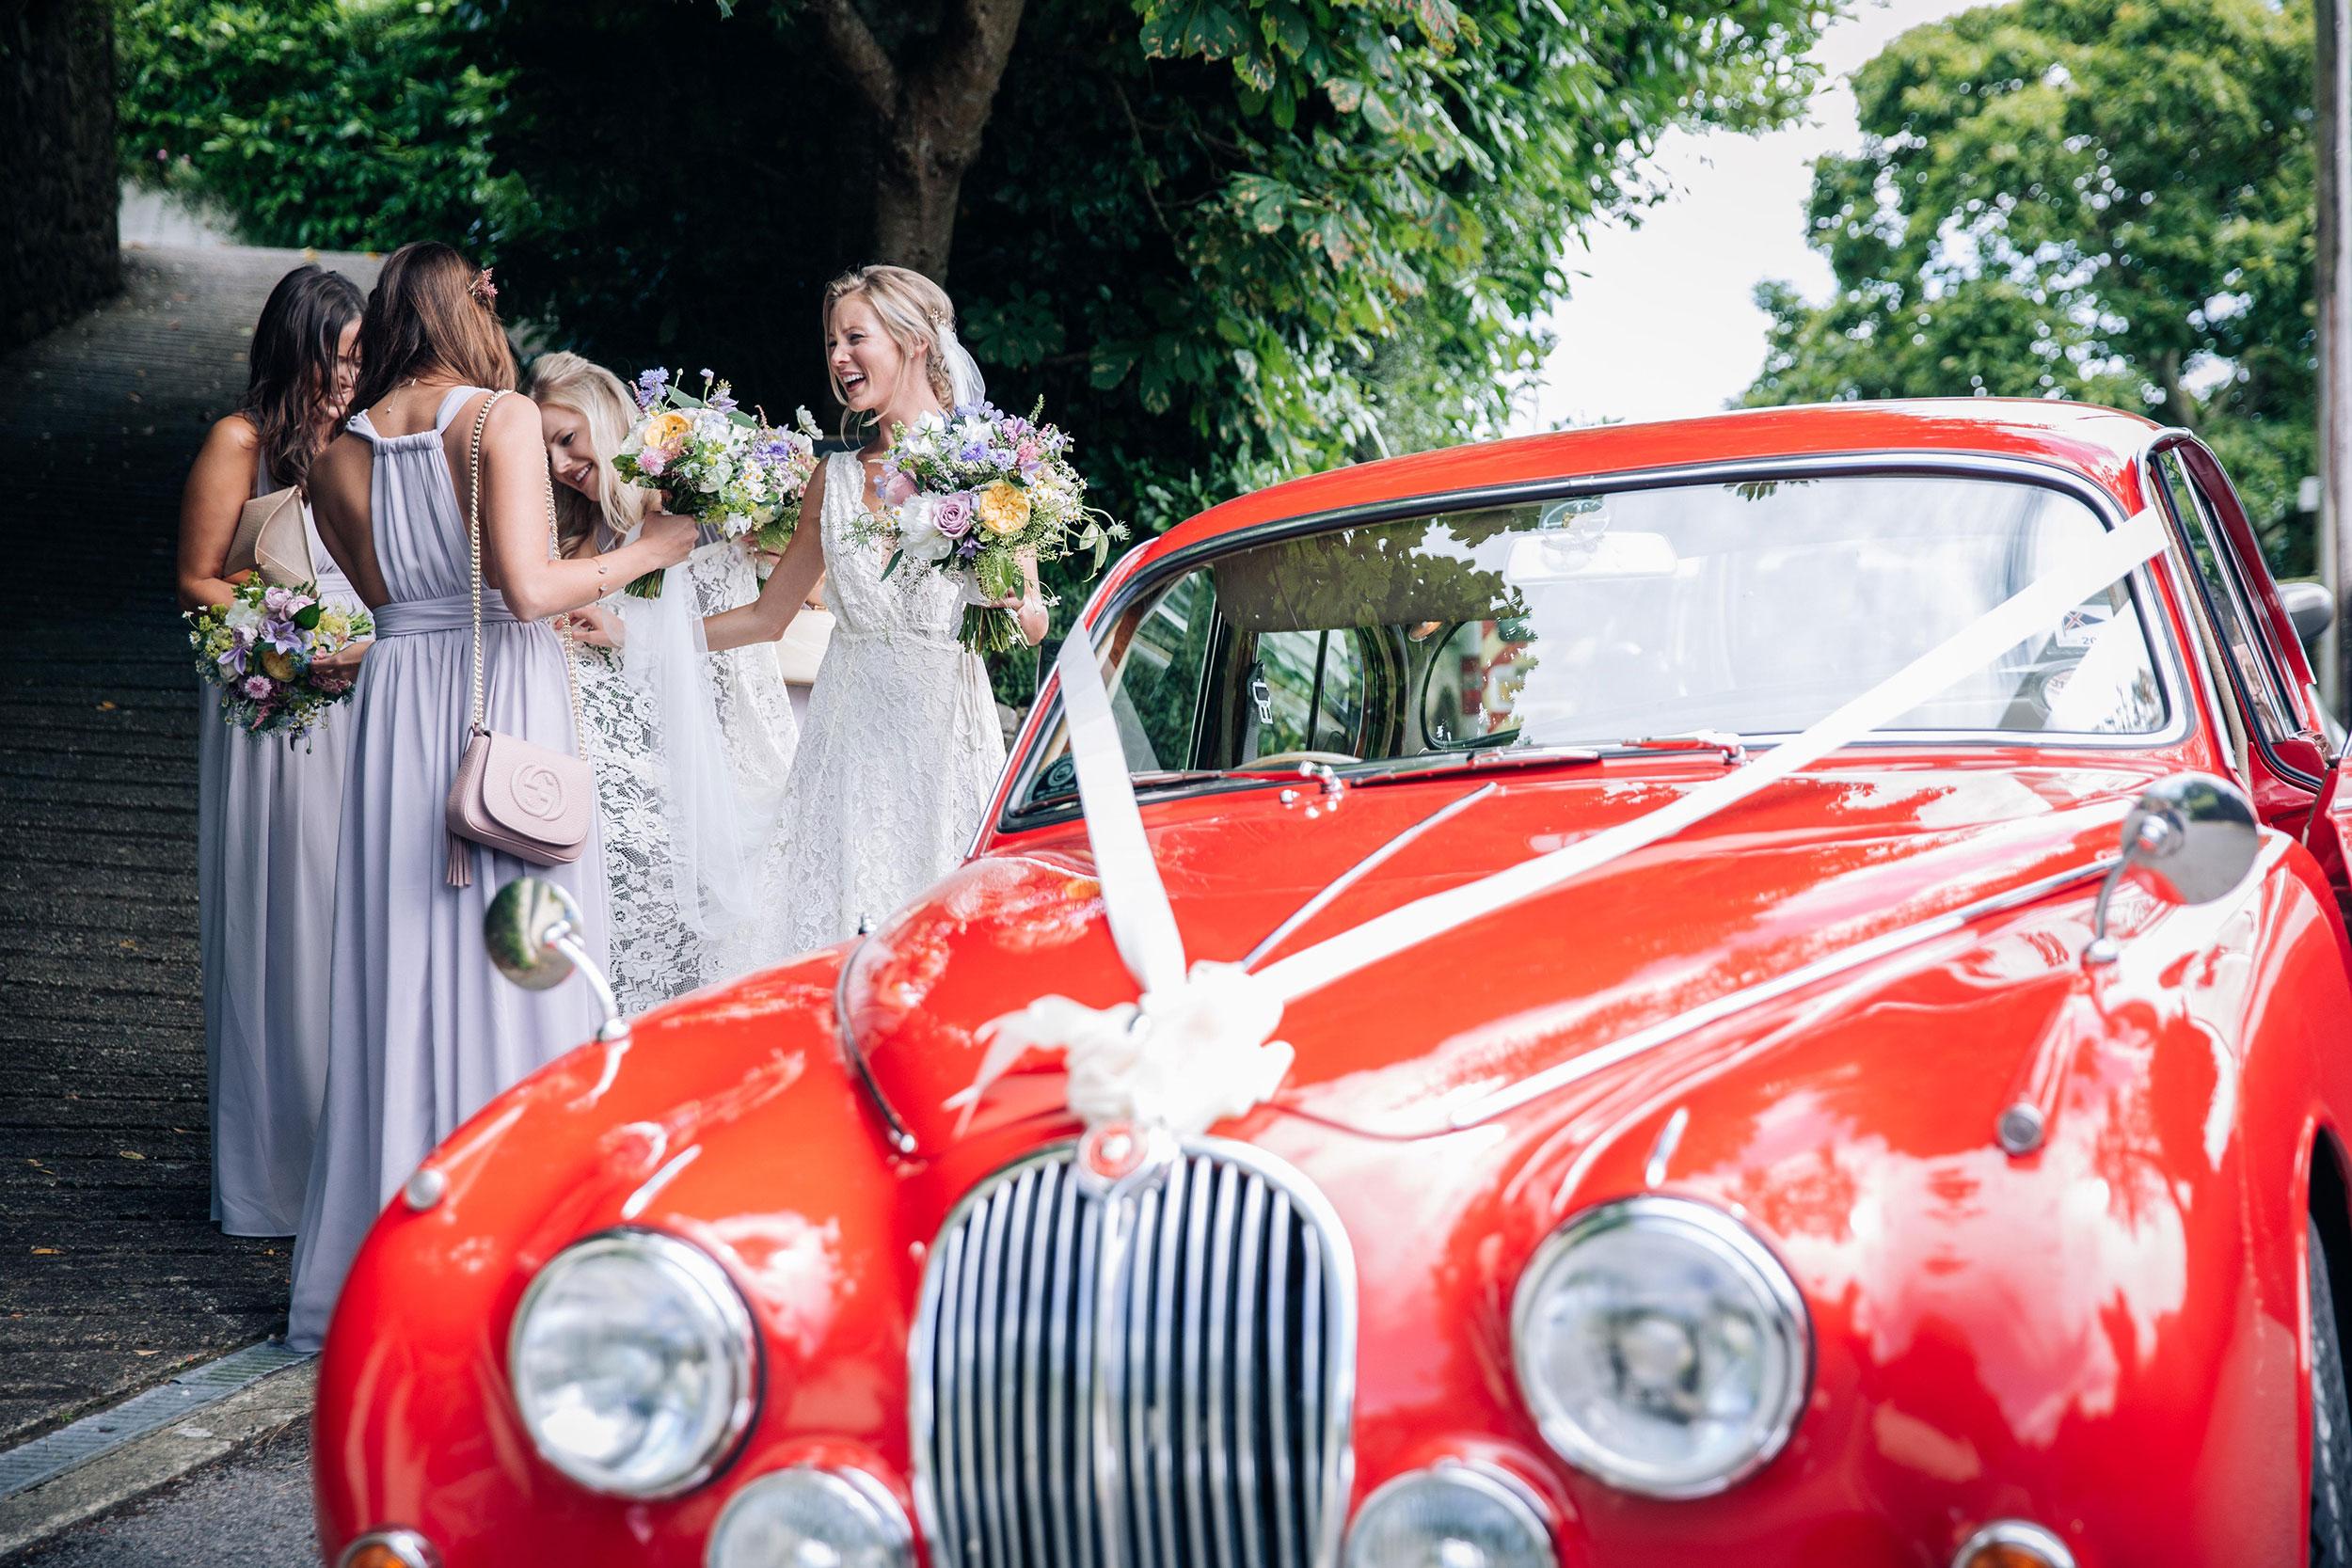 16.07.16-Tanya-&-Jethro-Wedding-Selection-25.jpg